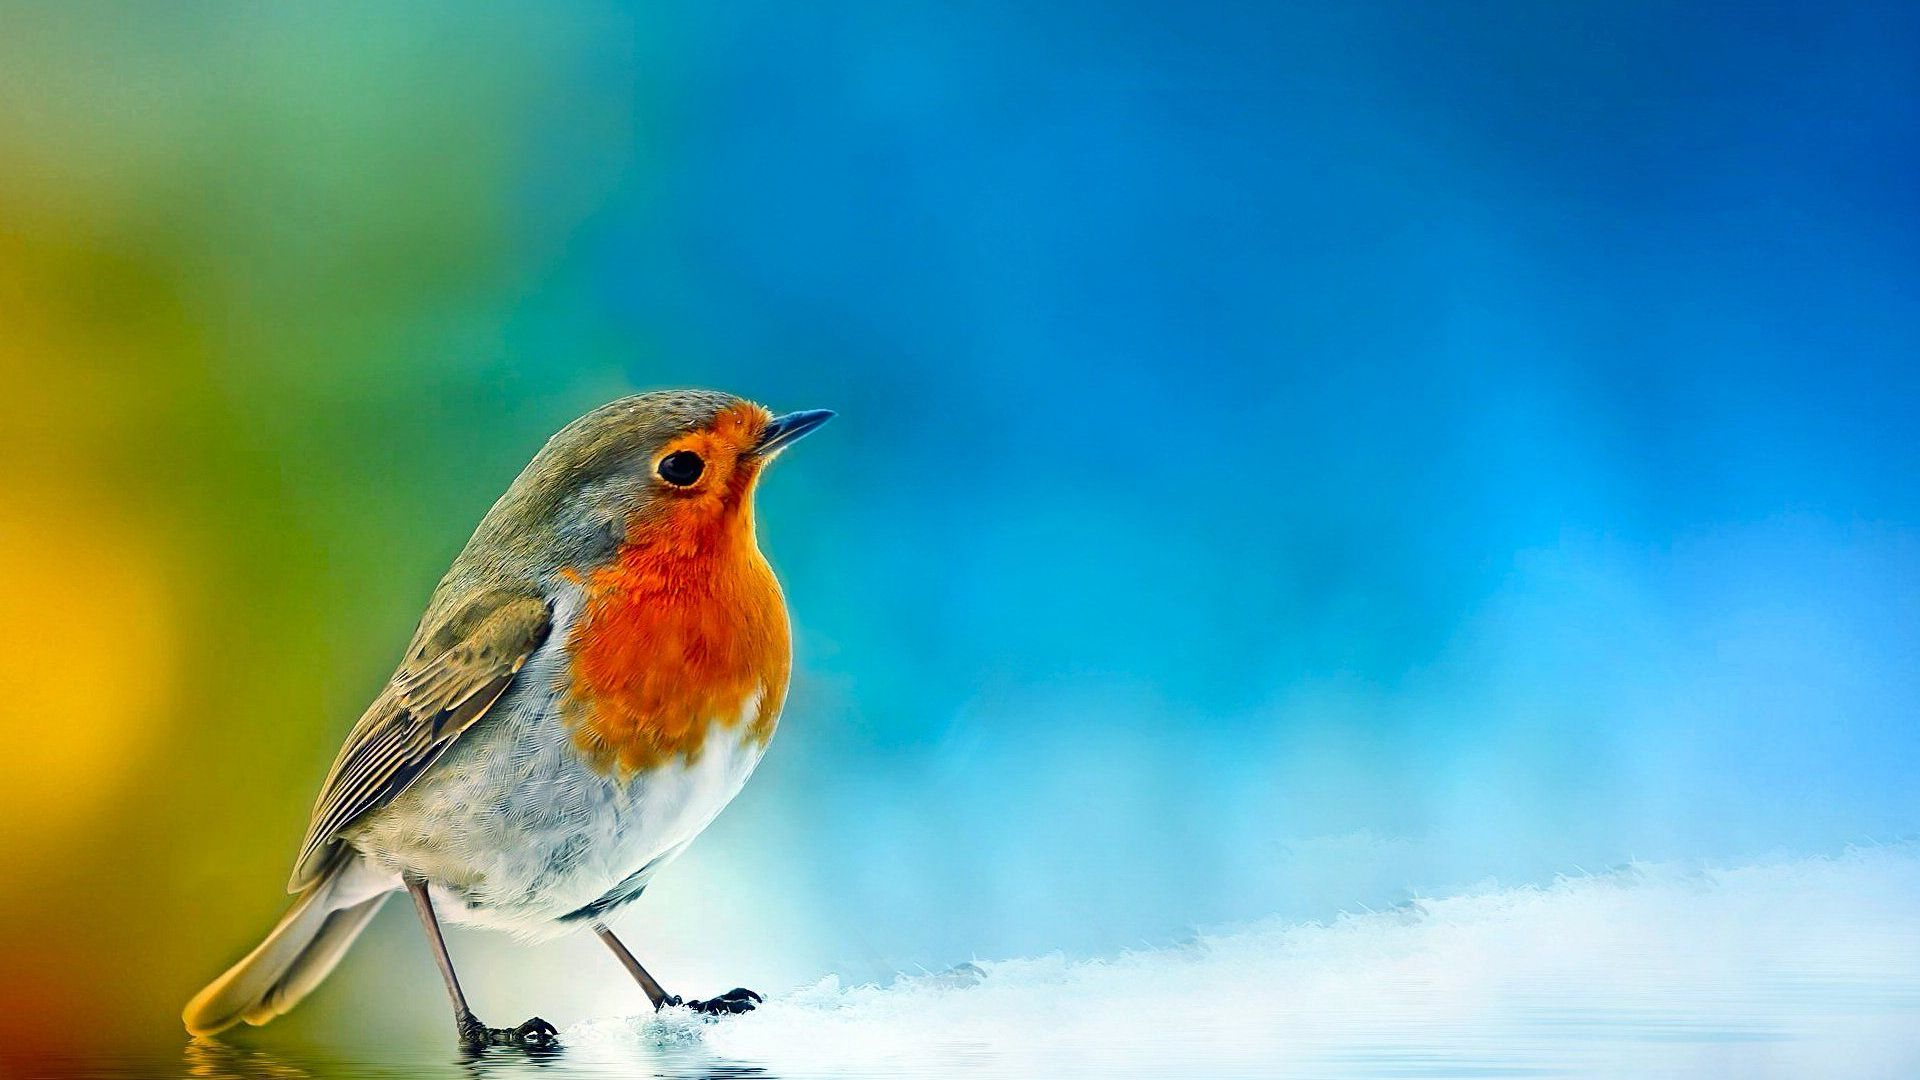 Download Small orange bird wallpaper 1920x1080